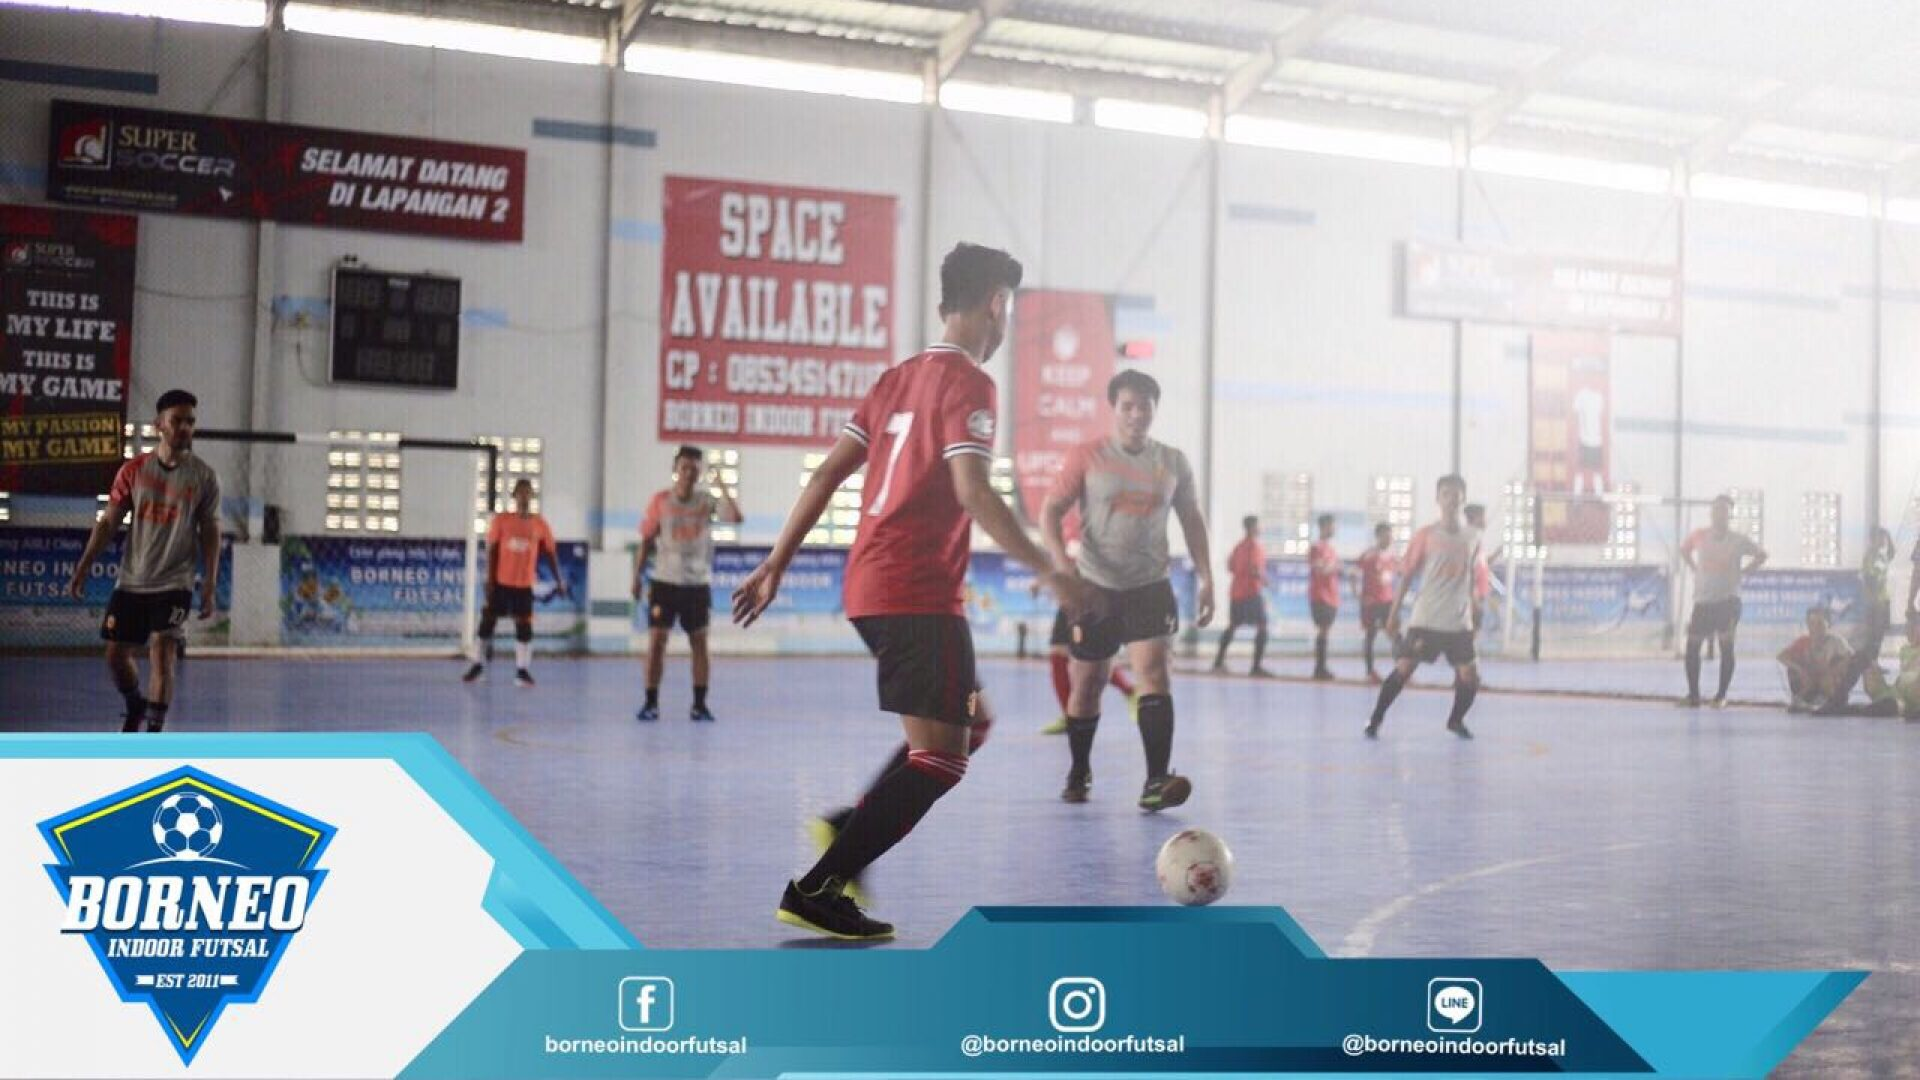 Borneo Indoor Futsal